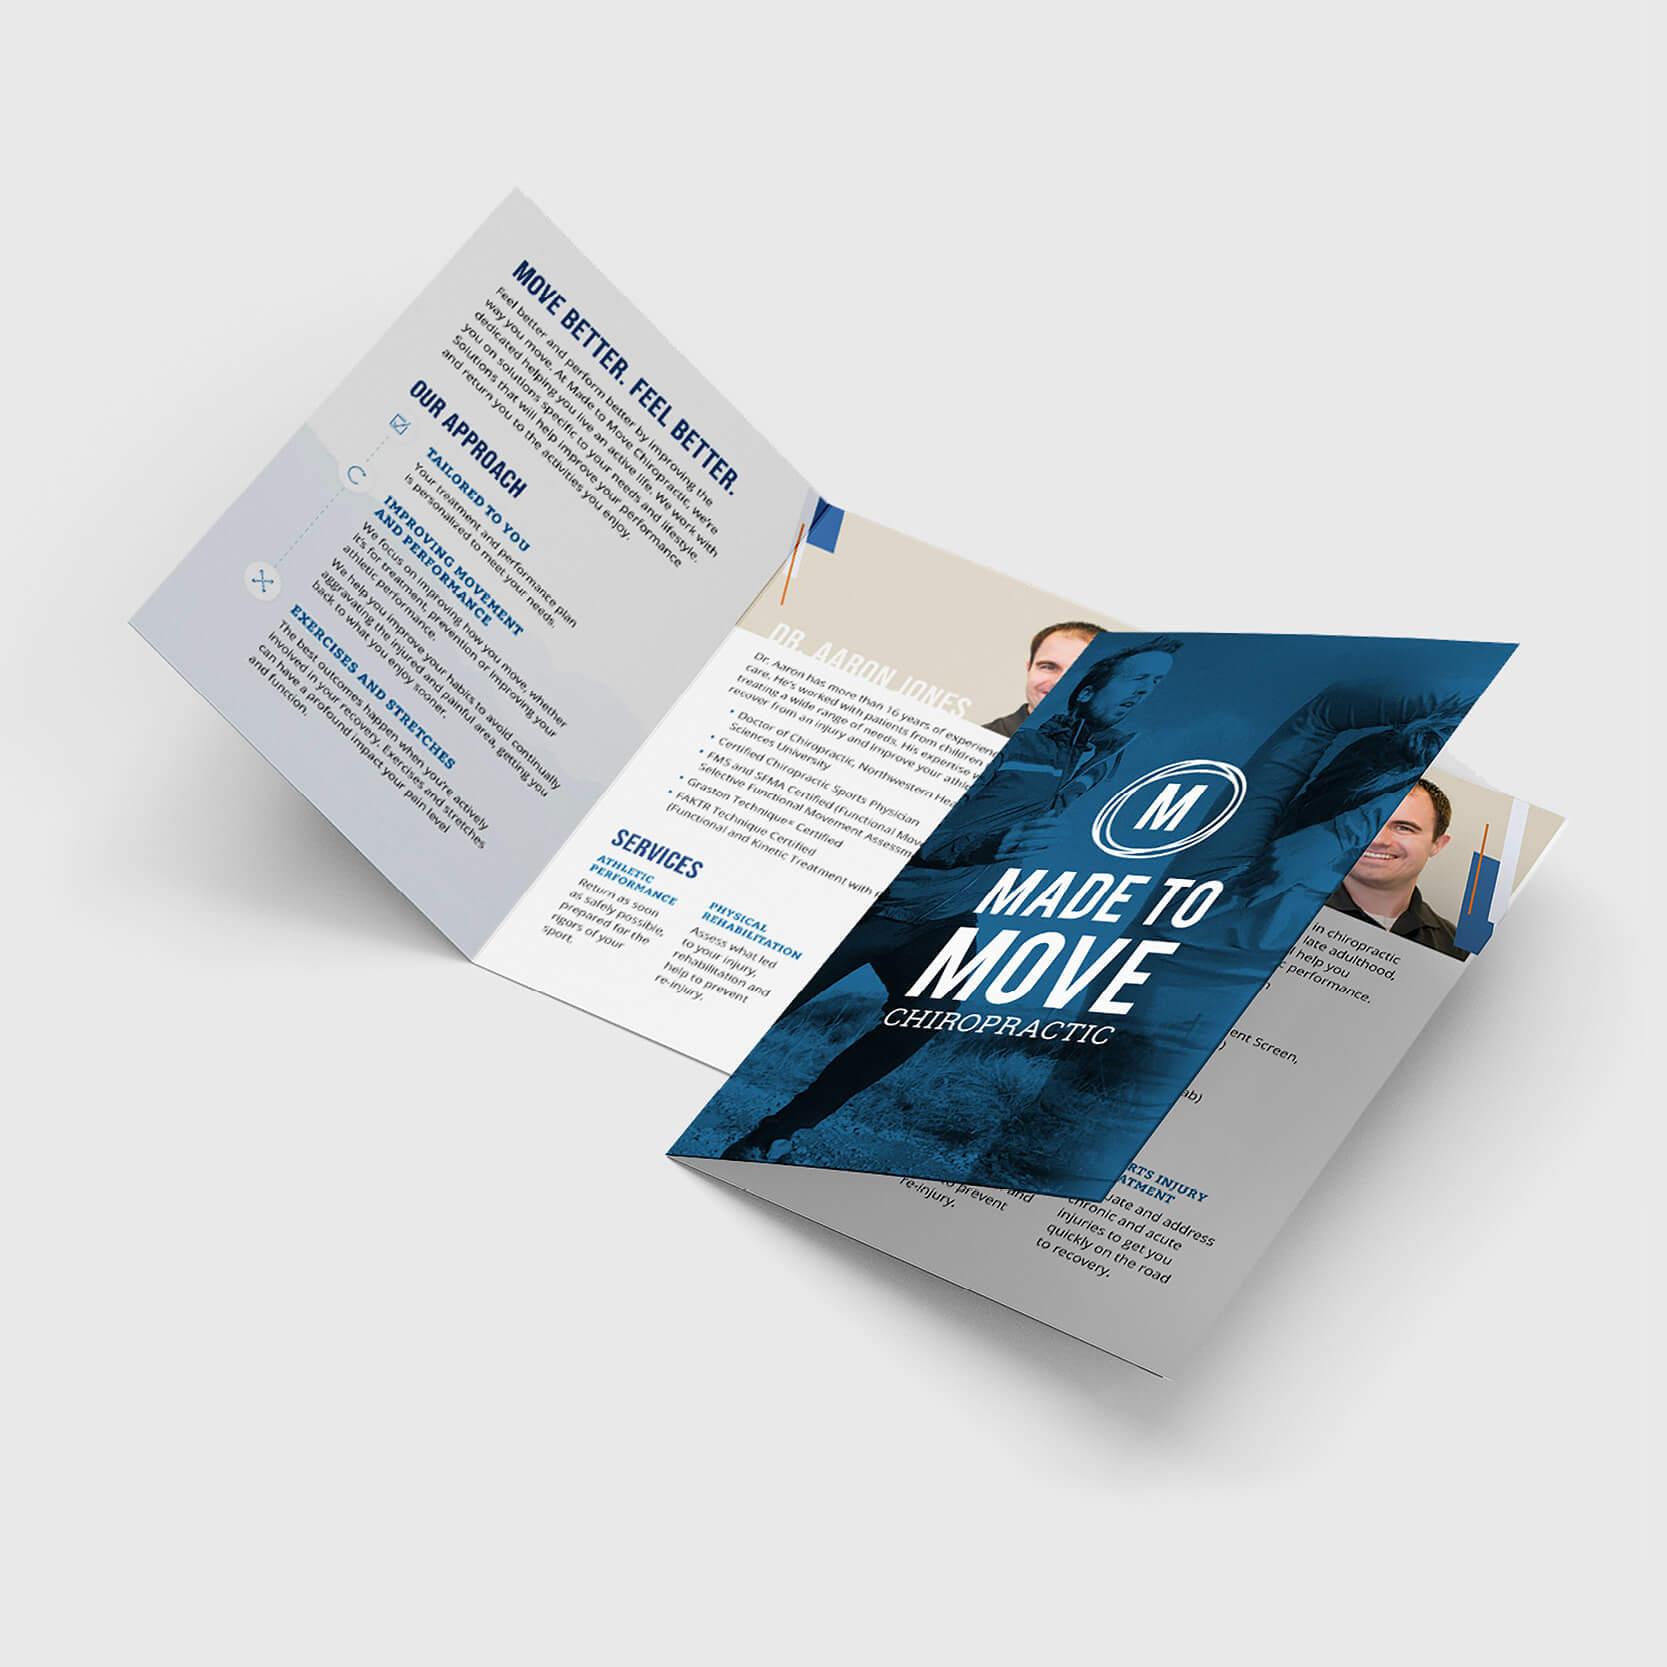 Spark27-CaseStudyGraphics-MadetoMove-Brochure